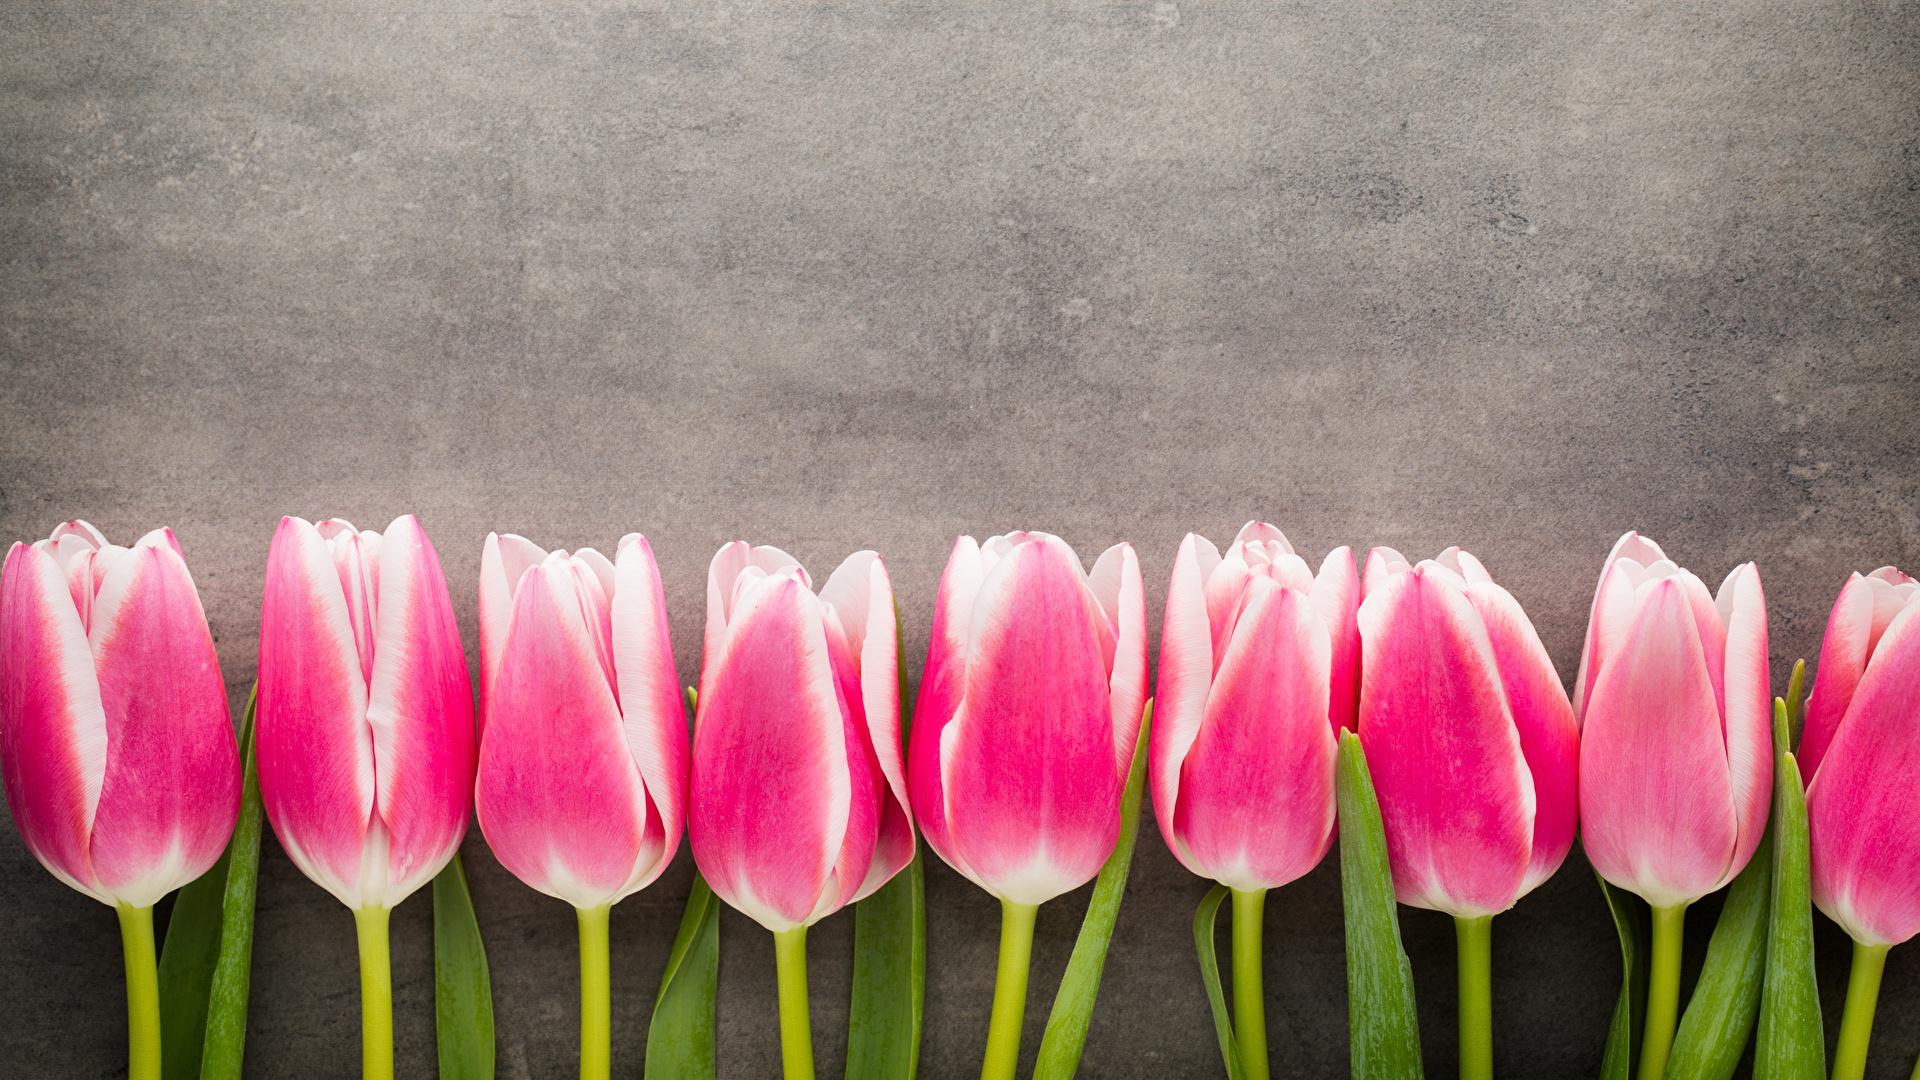 Картинка розовая Тюльпаны цветок 1920x1080 розовых розовые Розовый тюльпан Цветы